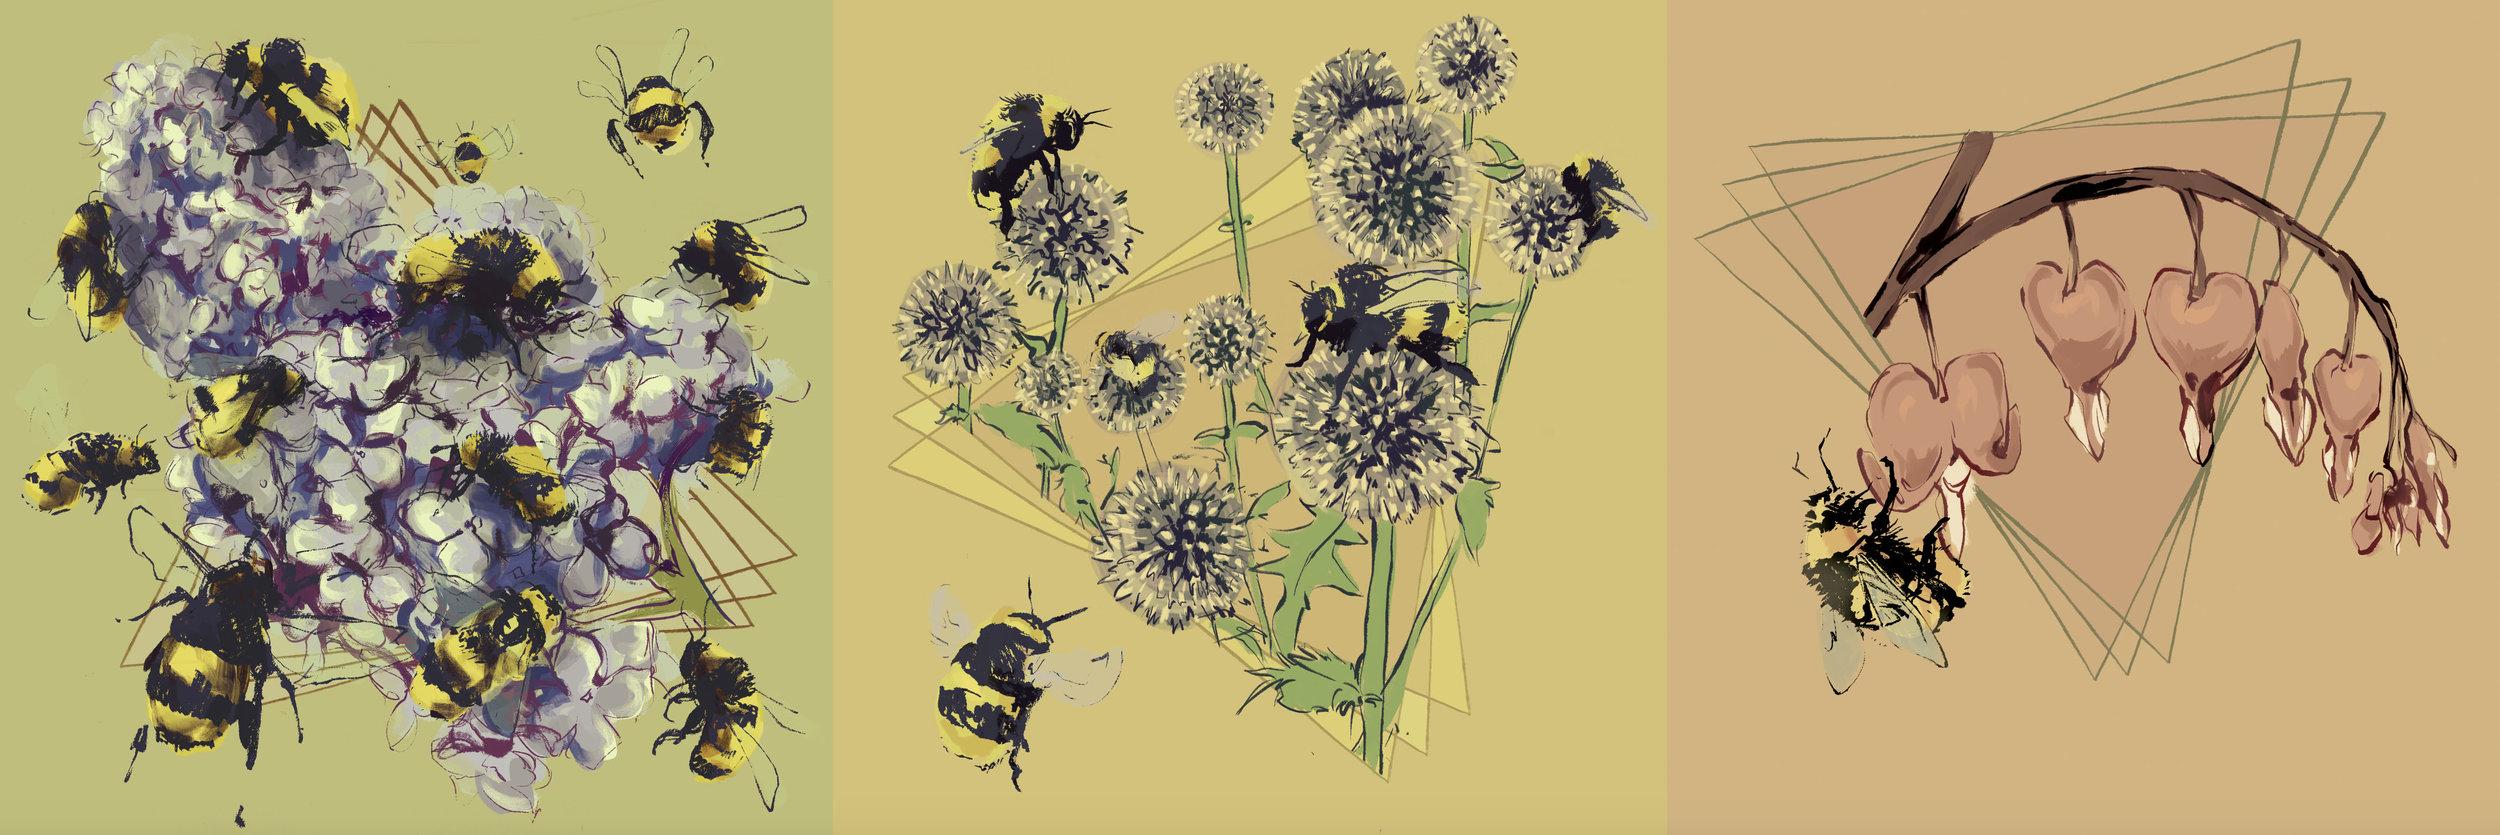 bees_combined.jpg